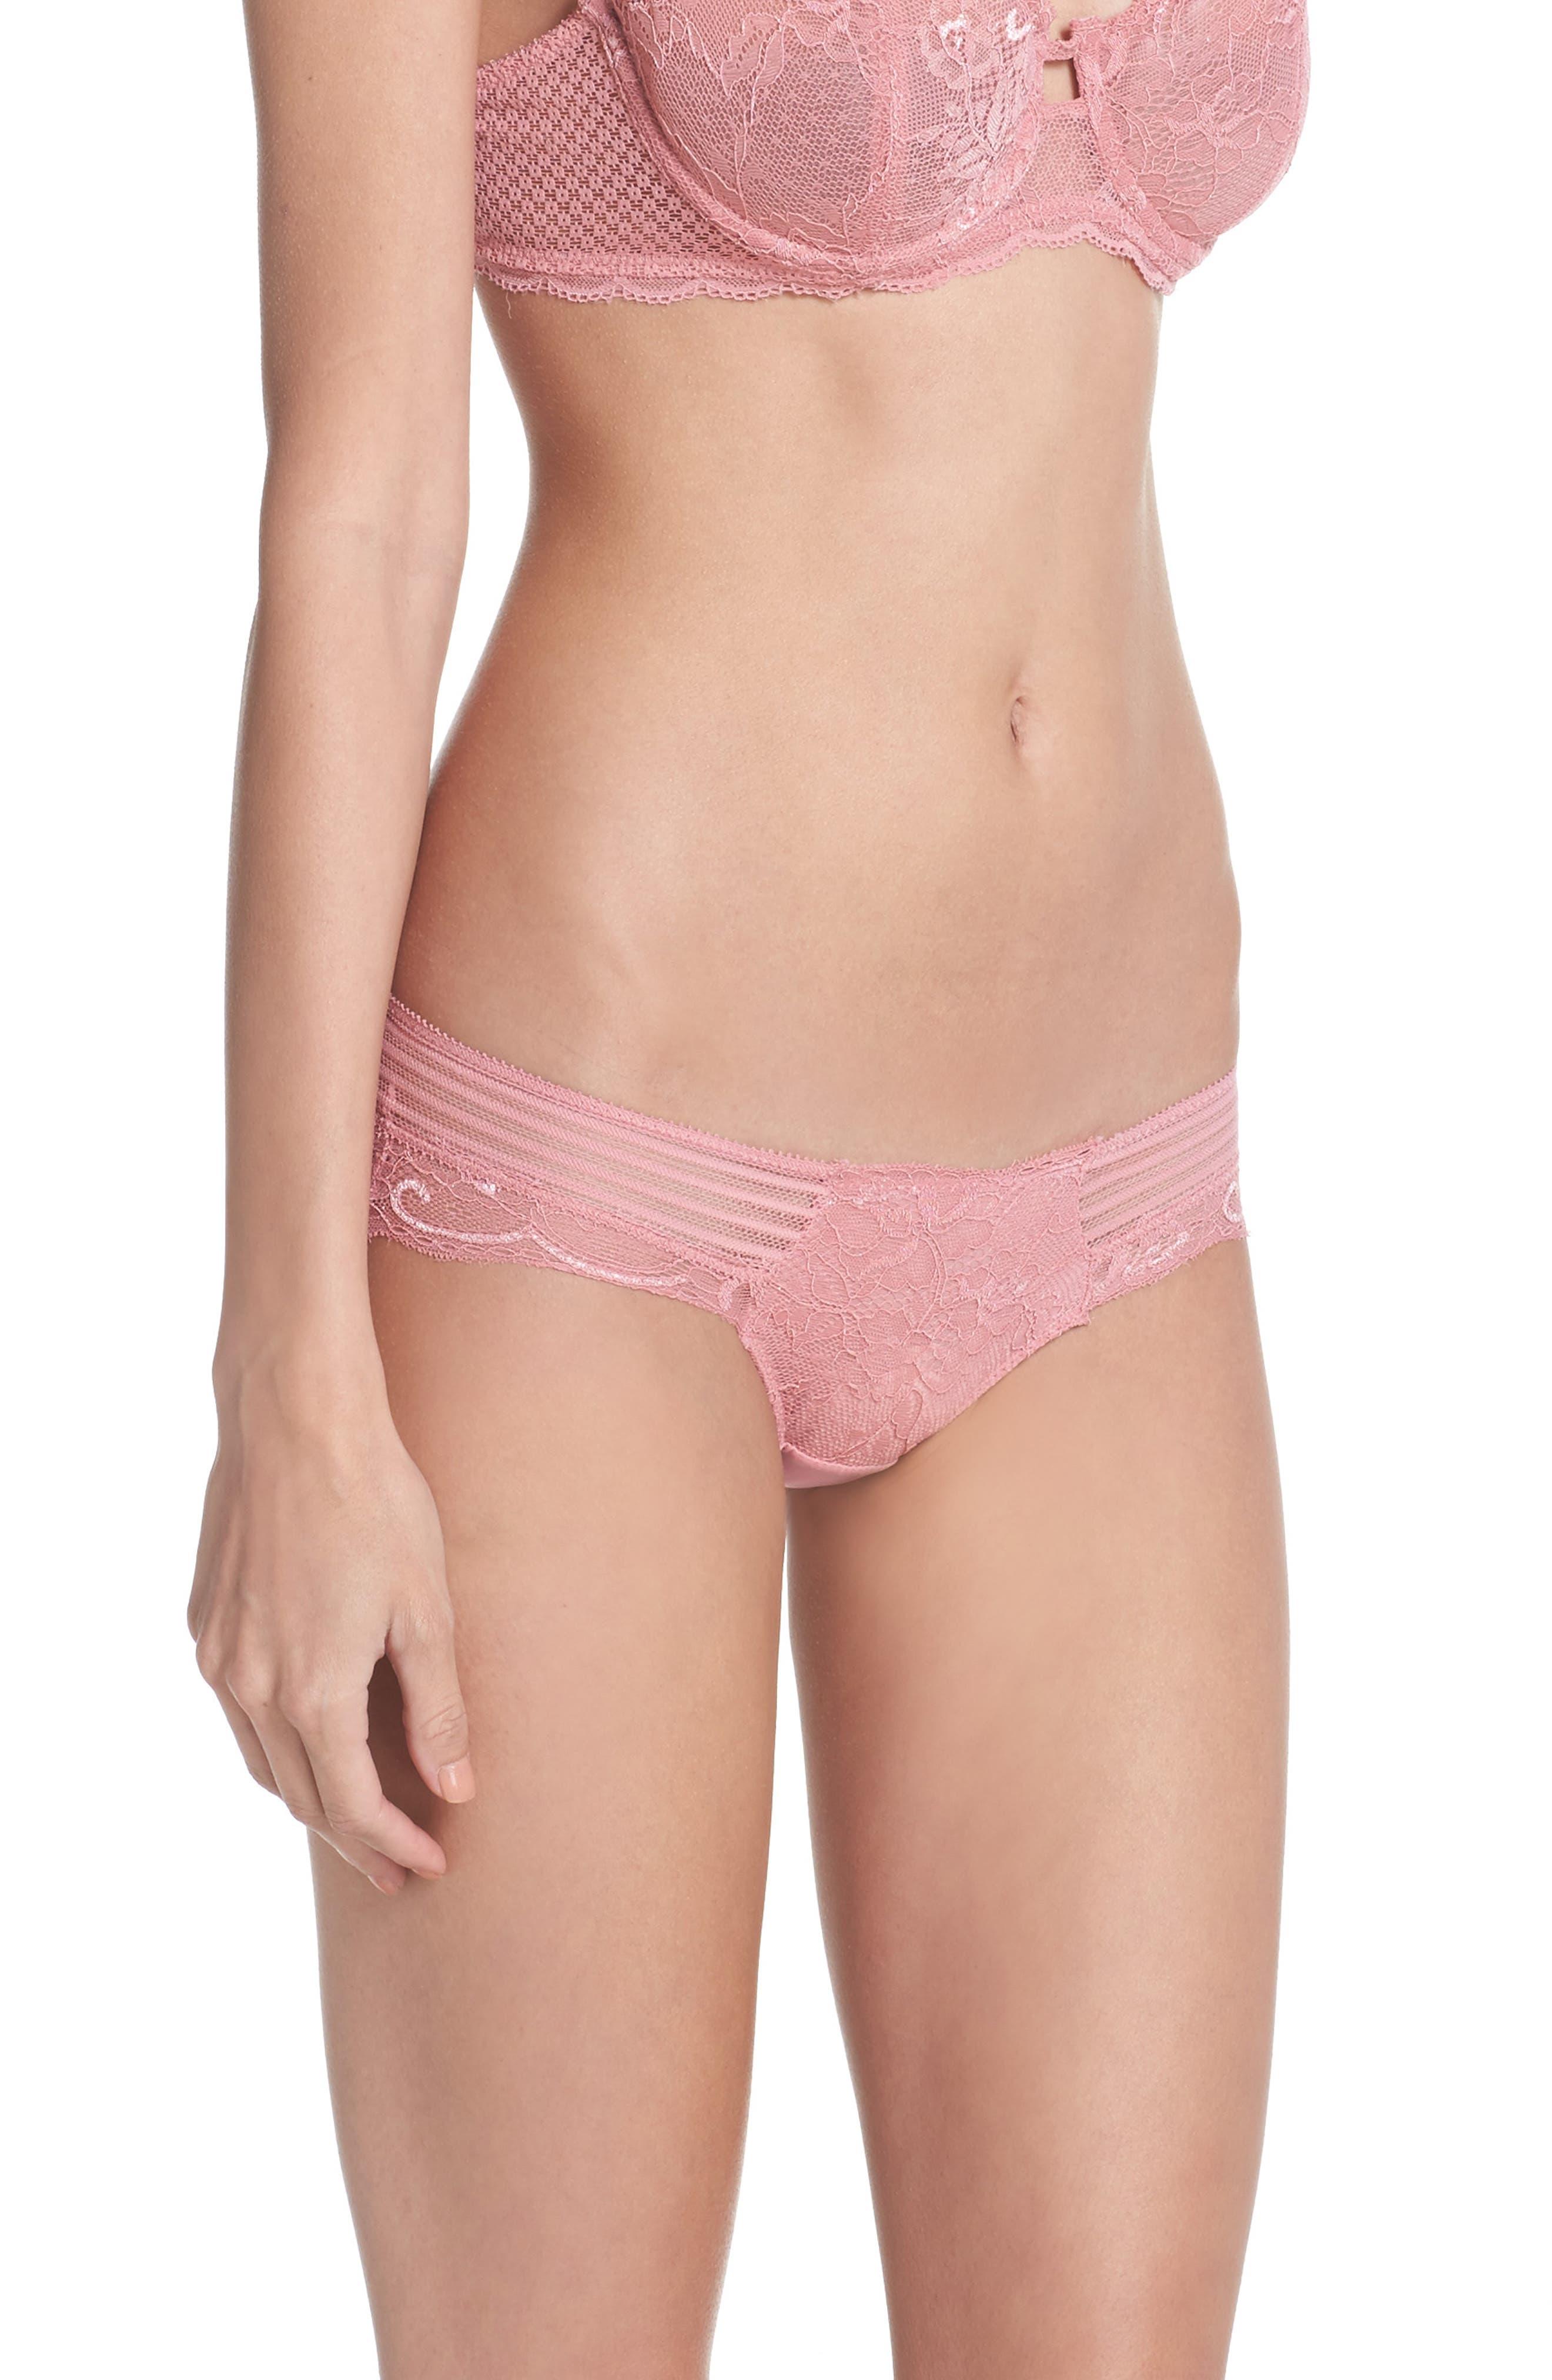 Lace Hipster Panties,                             Alternate thumbnail 3, color,                             Blush Pink